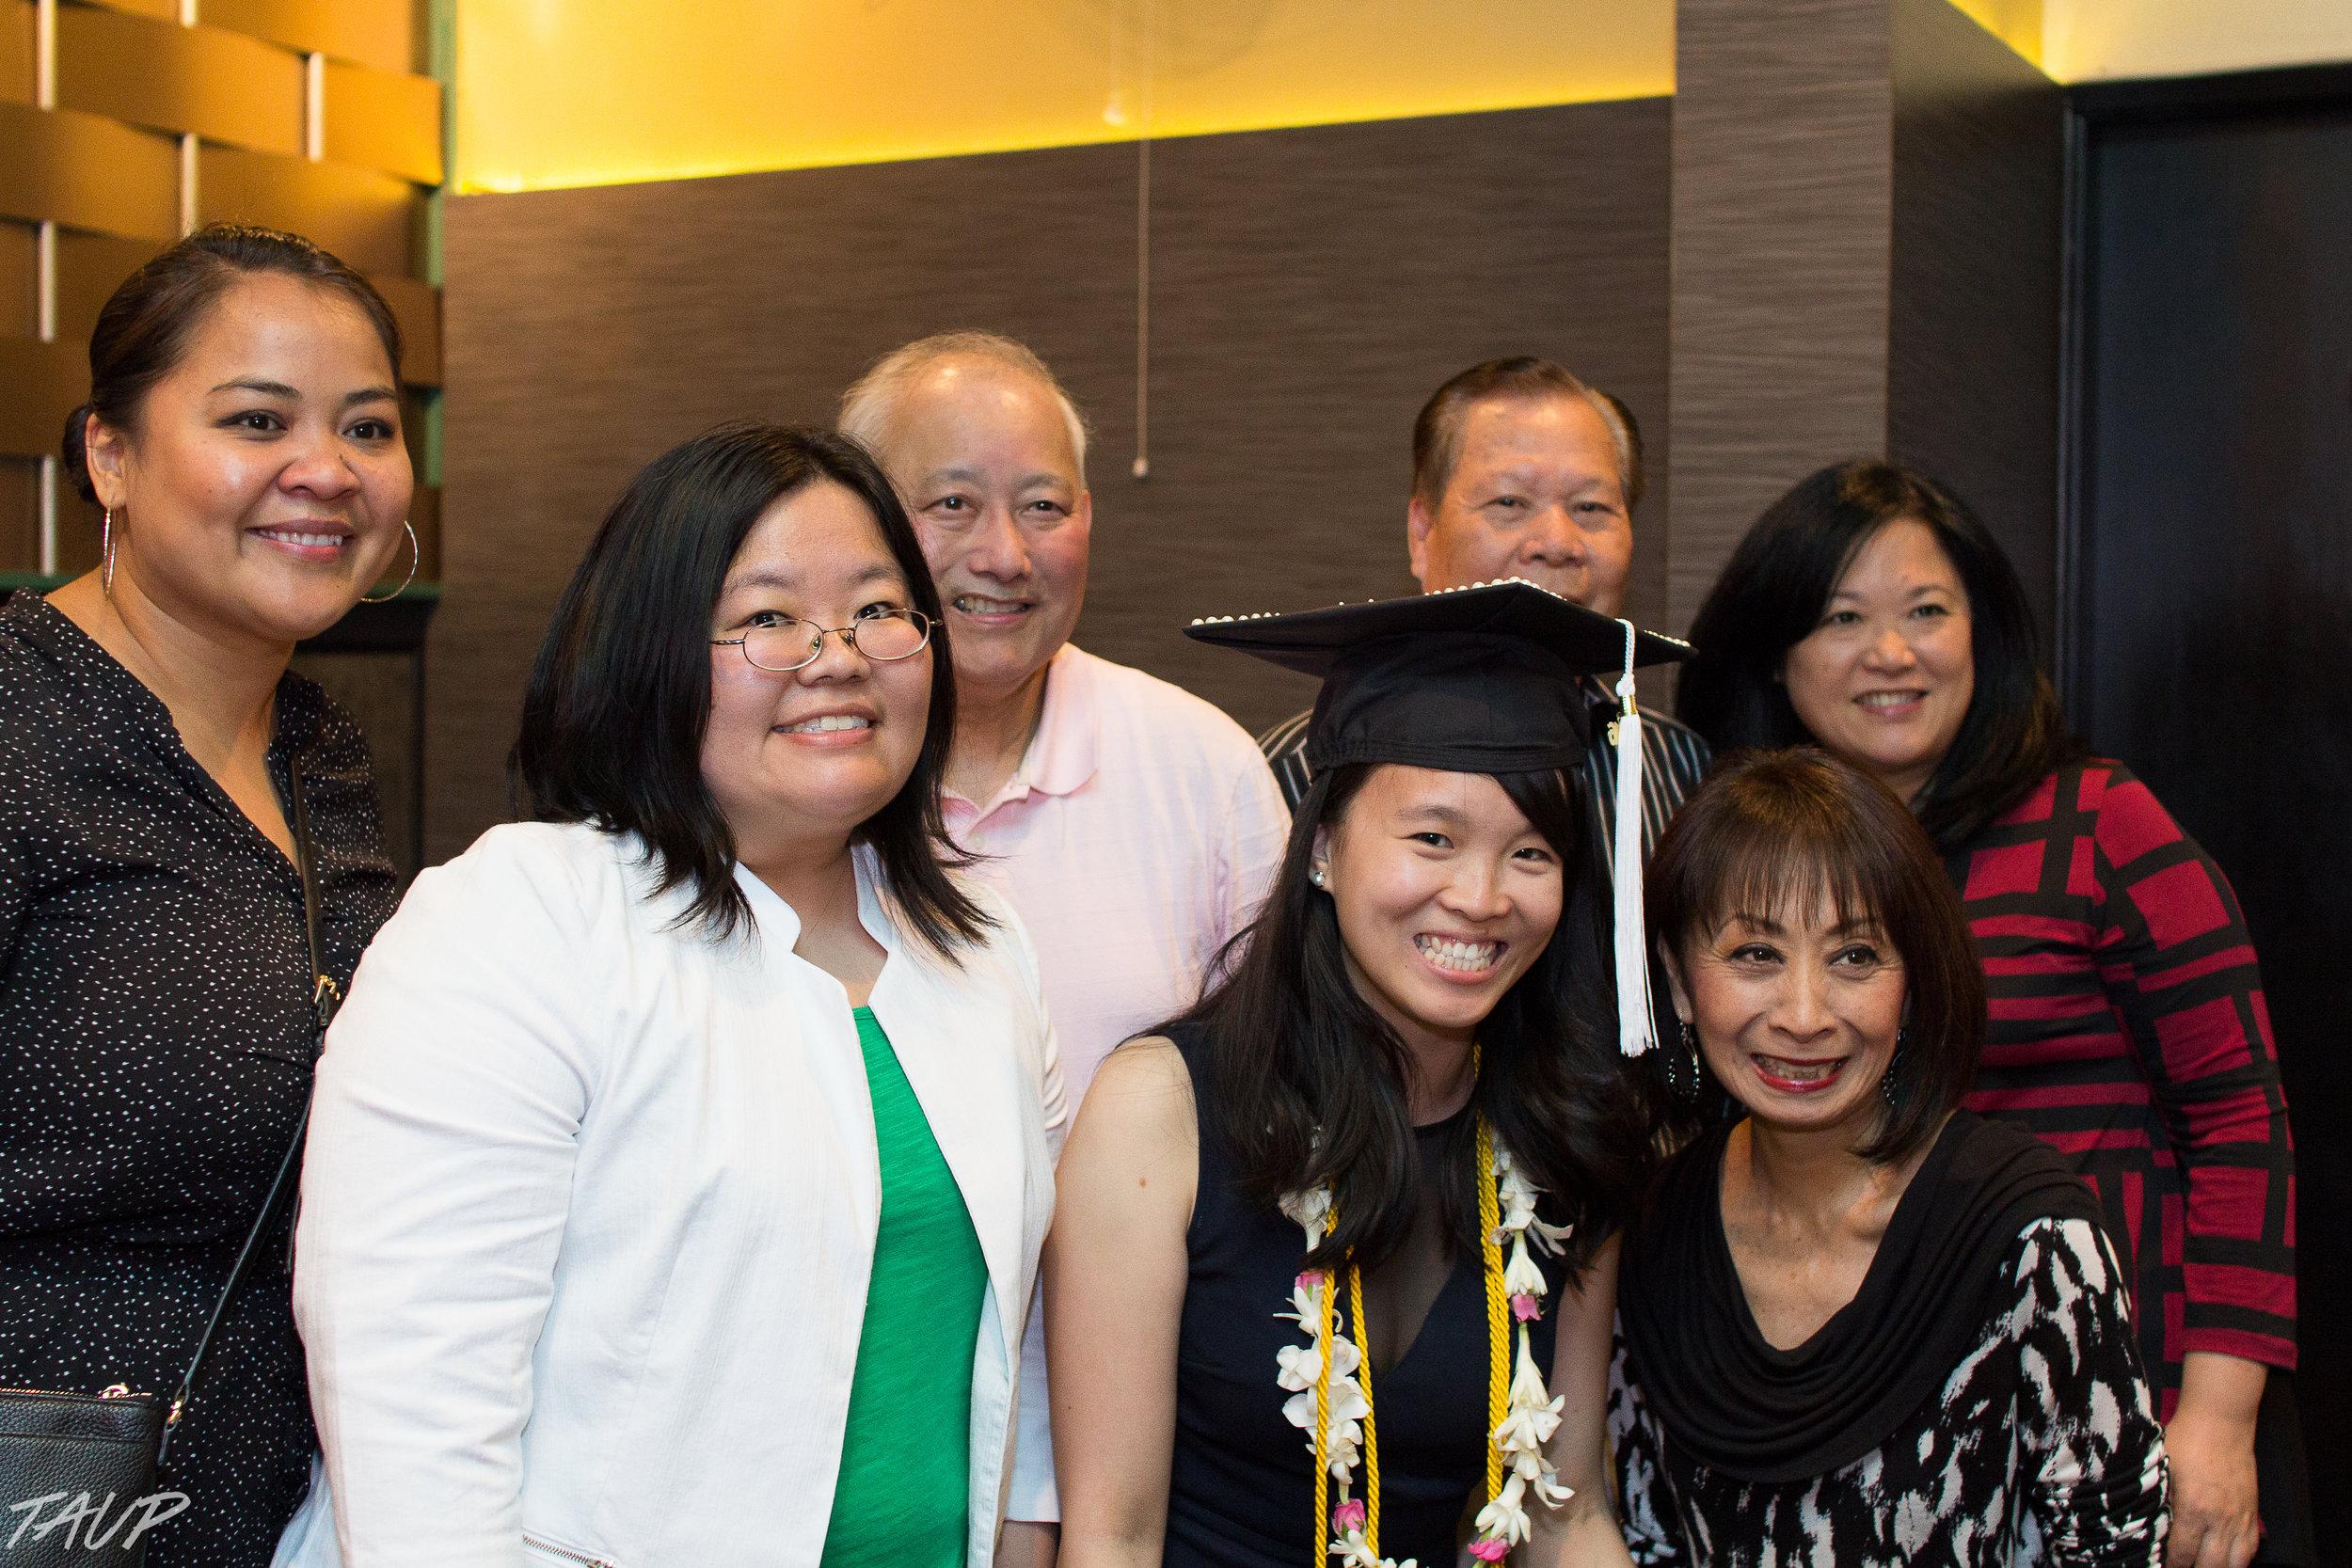 Pha Mom, Marci Nakano, Al Sugiyama, Chan Lo, Colleen Yamaguchi, and Vanna Novak celebrated Vivian's college graduation. Vivian graduated from University of Washington, Class of 2016, majoring in Creative Writing & Communication.